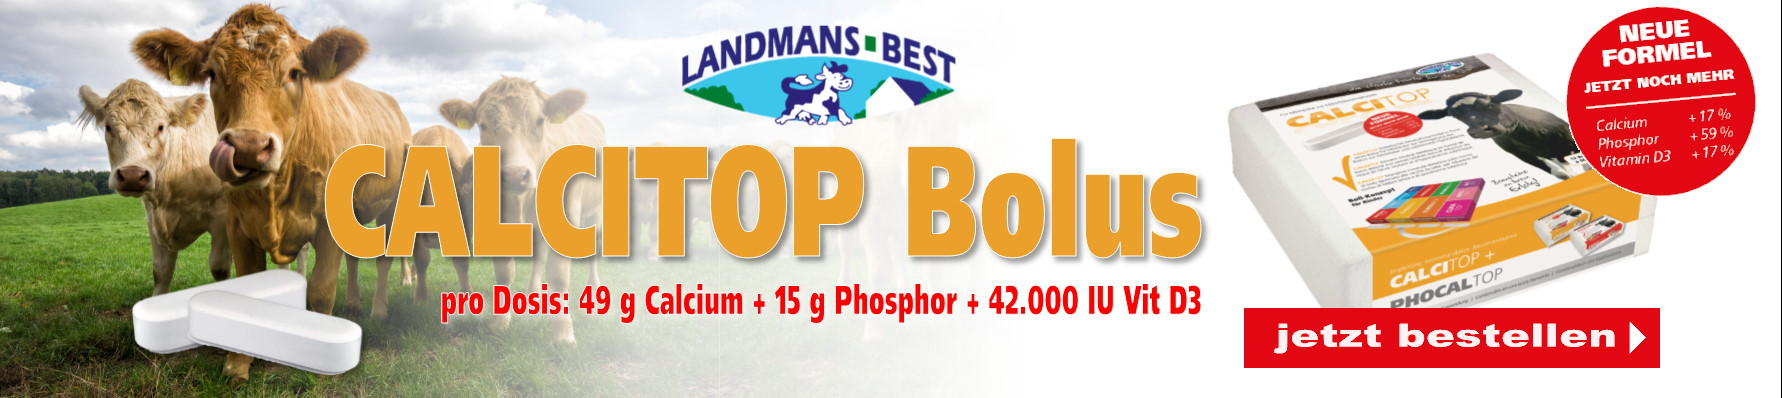 Banner Landmans Best Calcitop